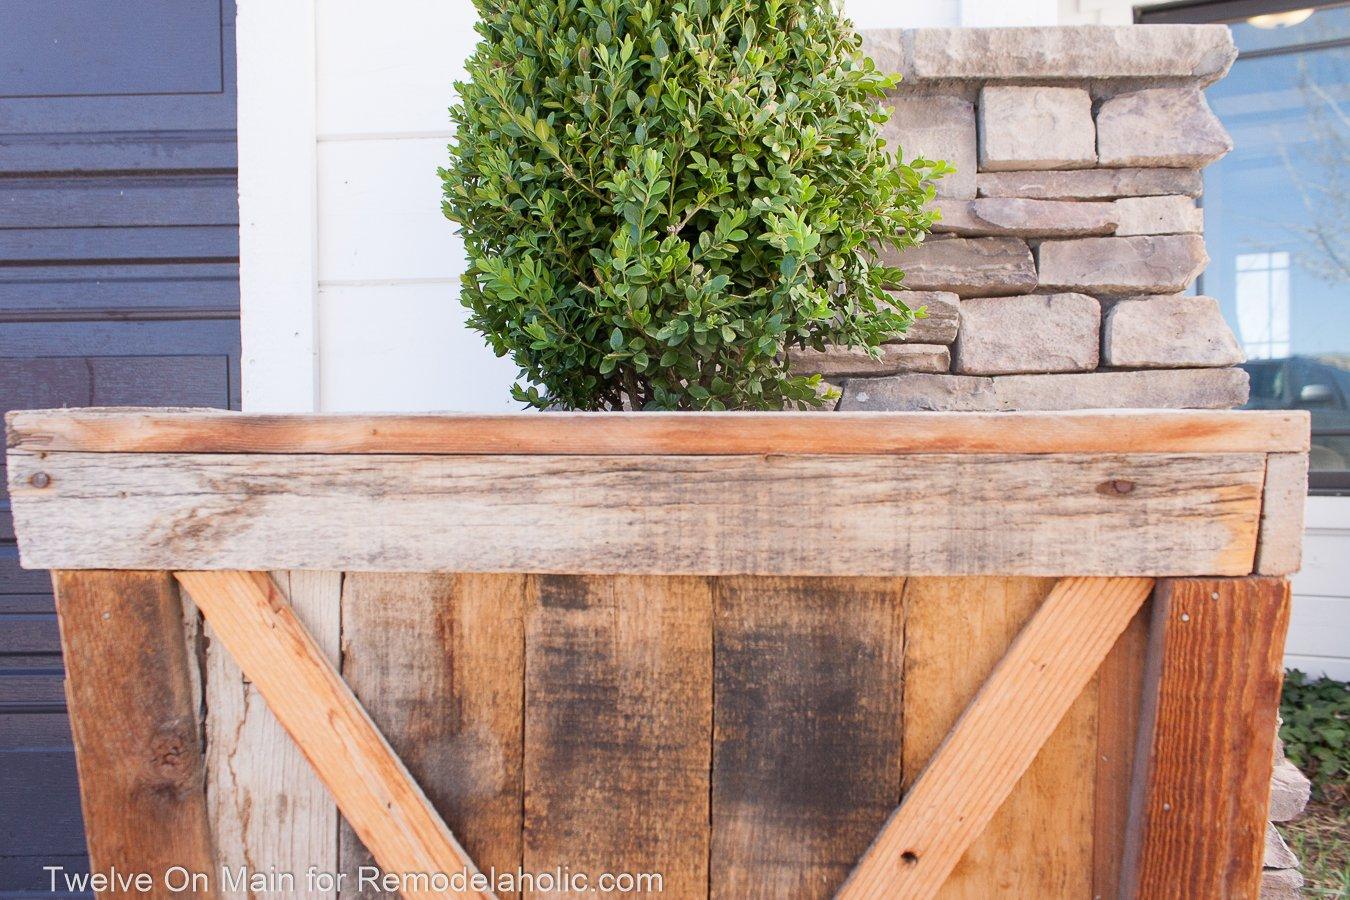 Remodelaholic DIY Large Pallet Planters